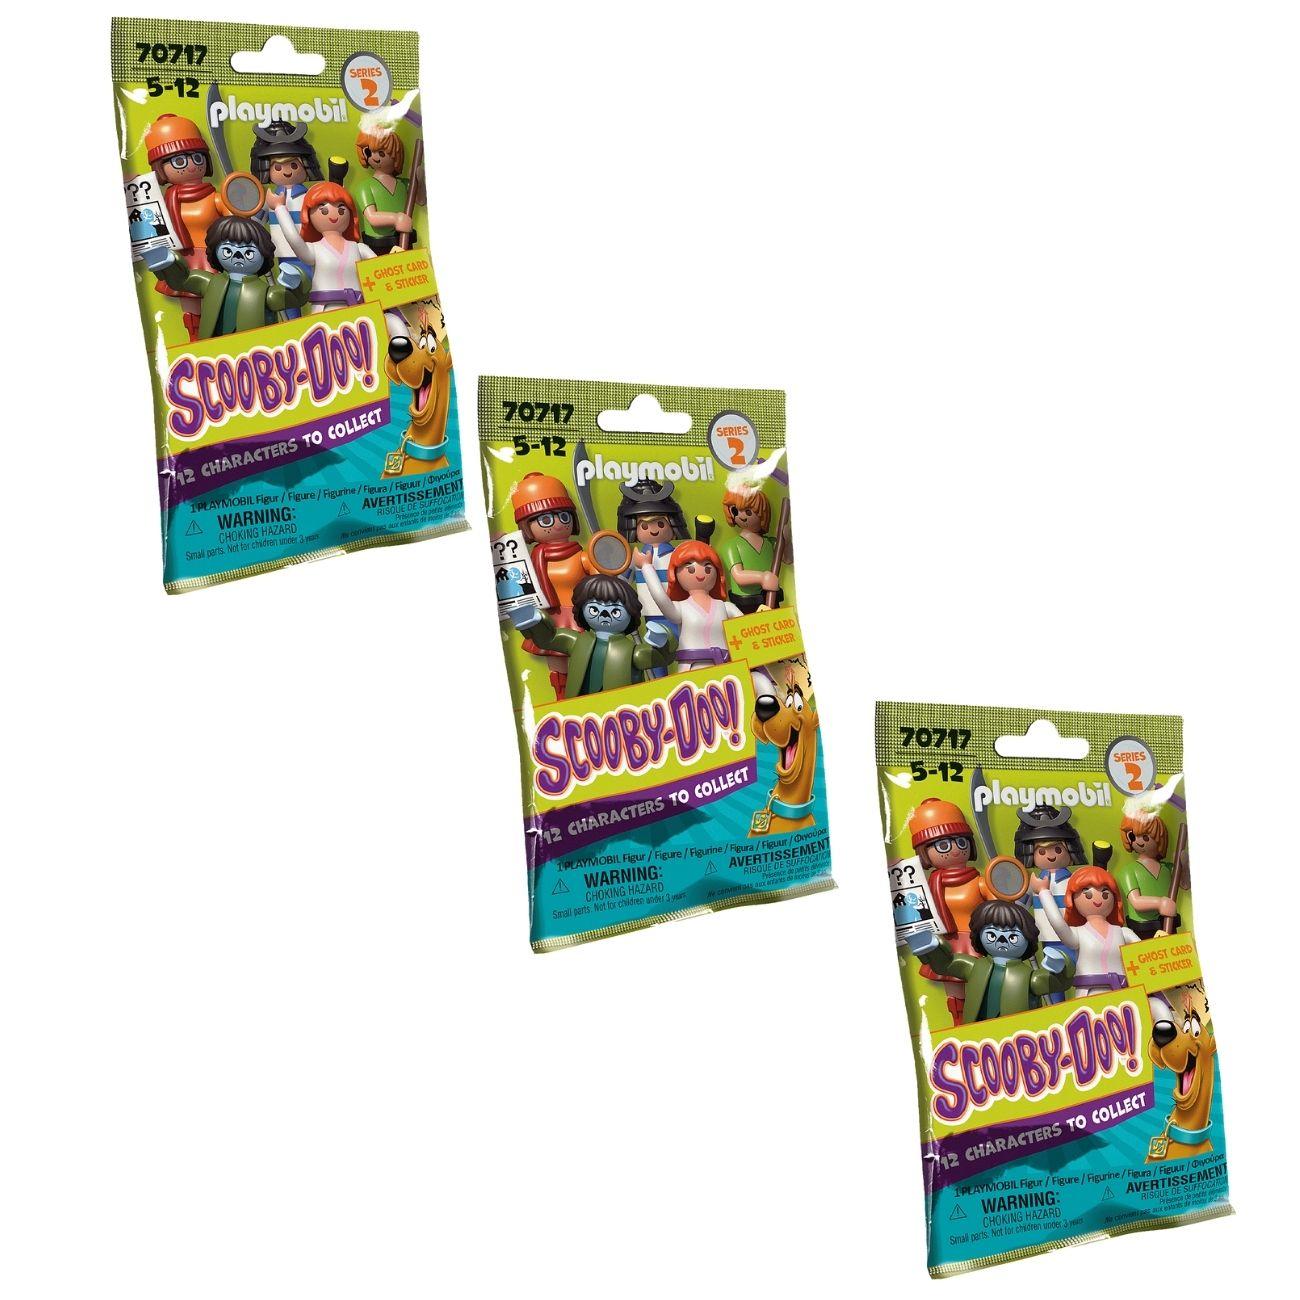 Playmobil Scooby Doo - 3 Figuras Surpresa Colecionável 70717